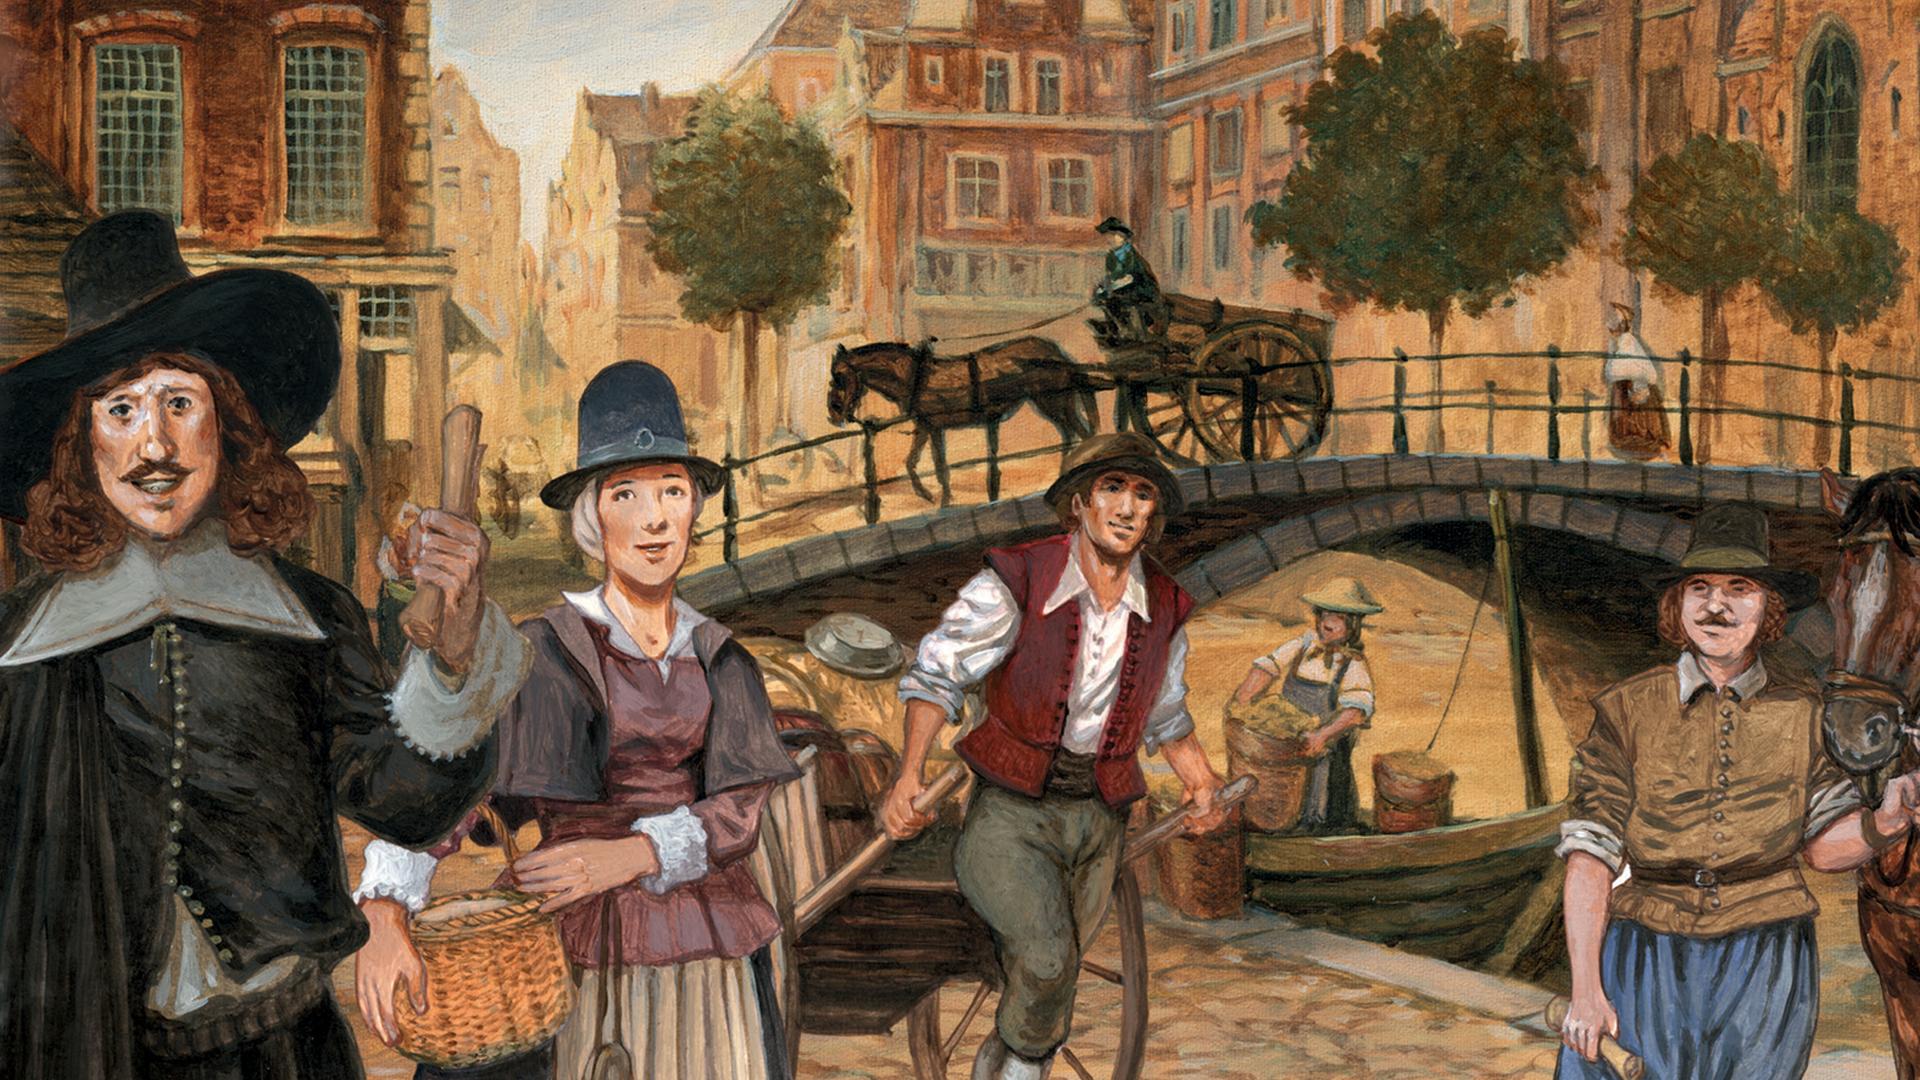 Ticket to Ride: Amsterdam board game artwork